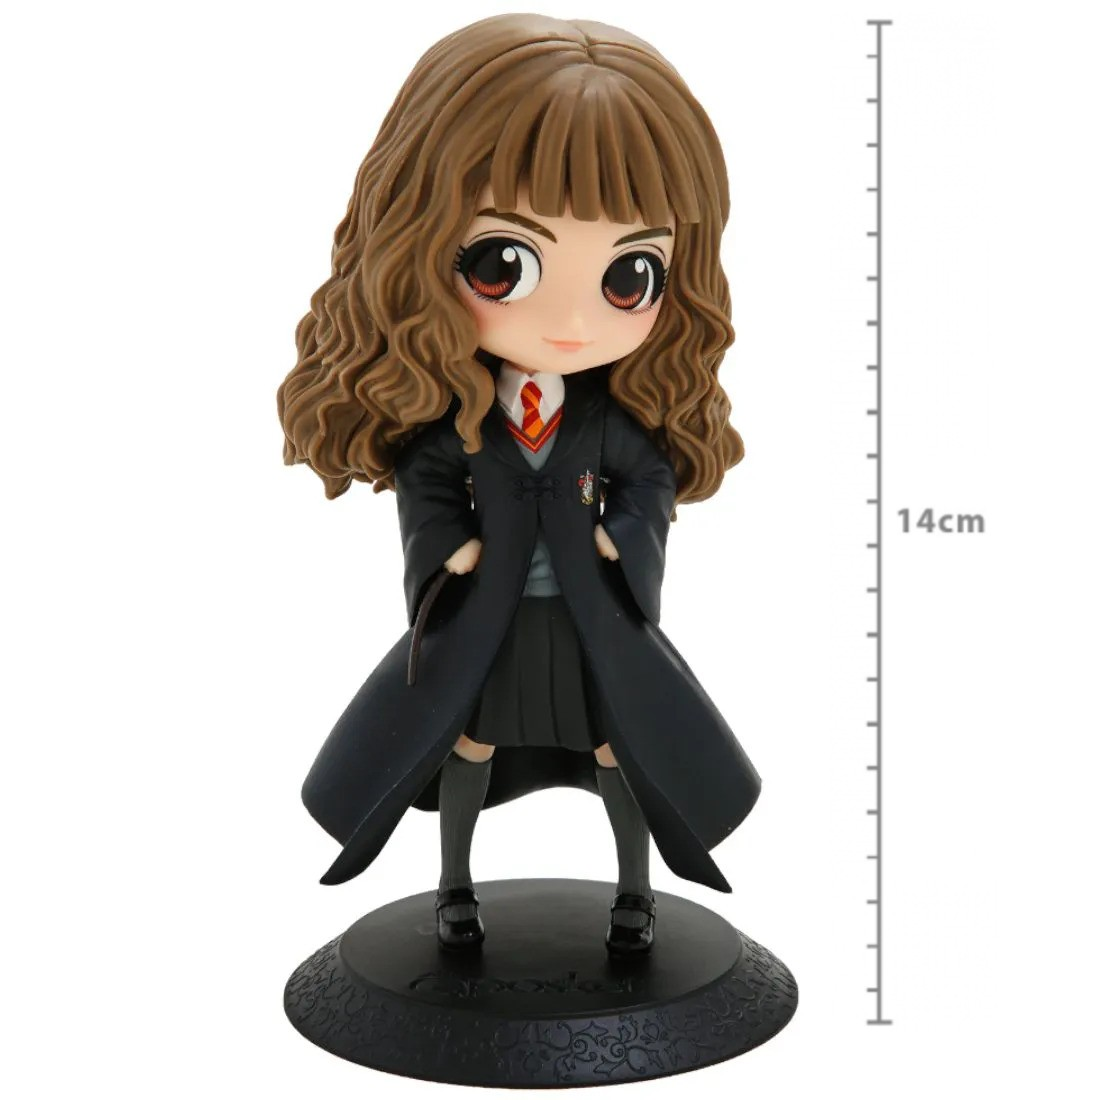 Harry Potter - Hermione Granger A - Q Posket - Banpresto